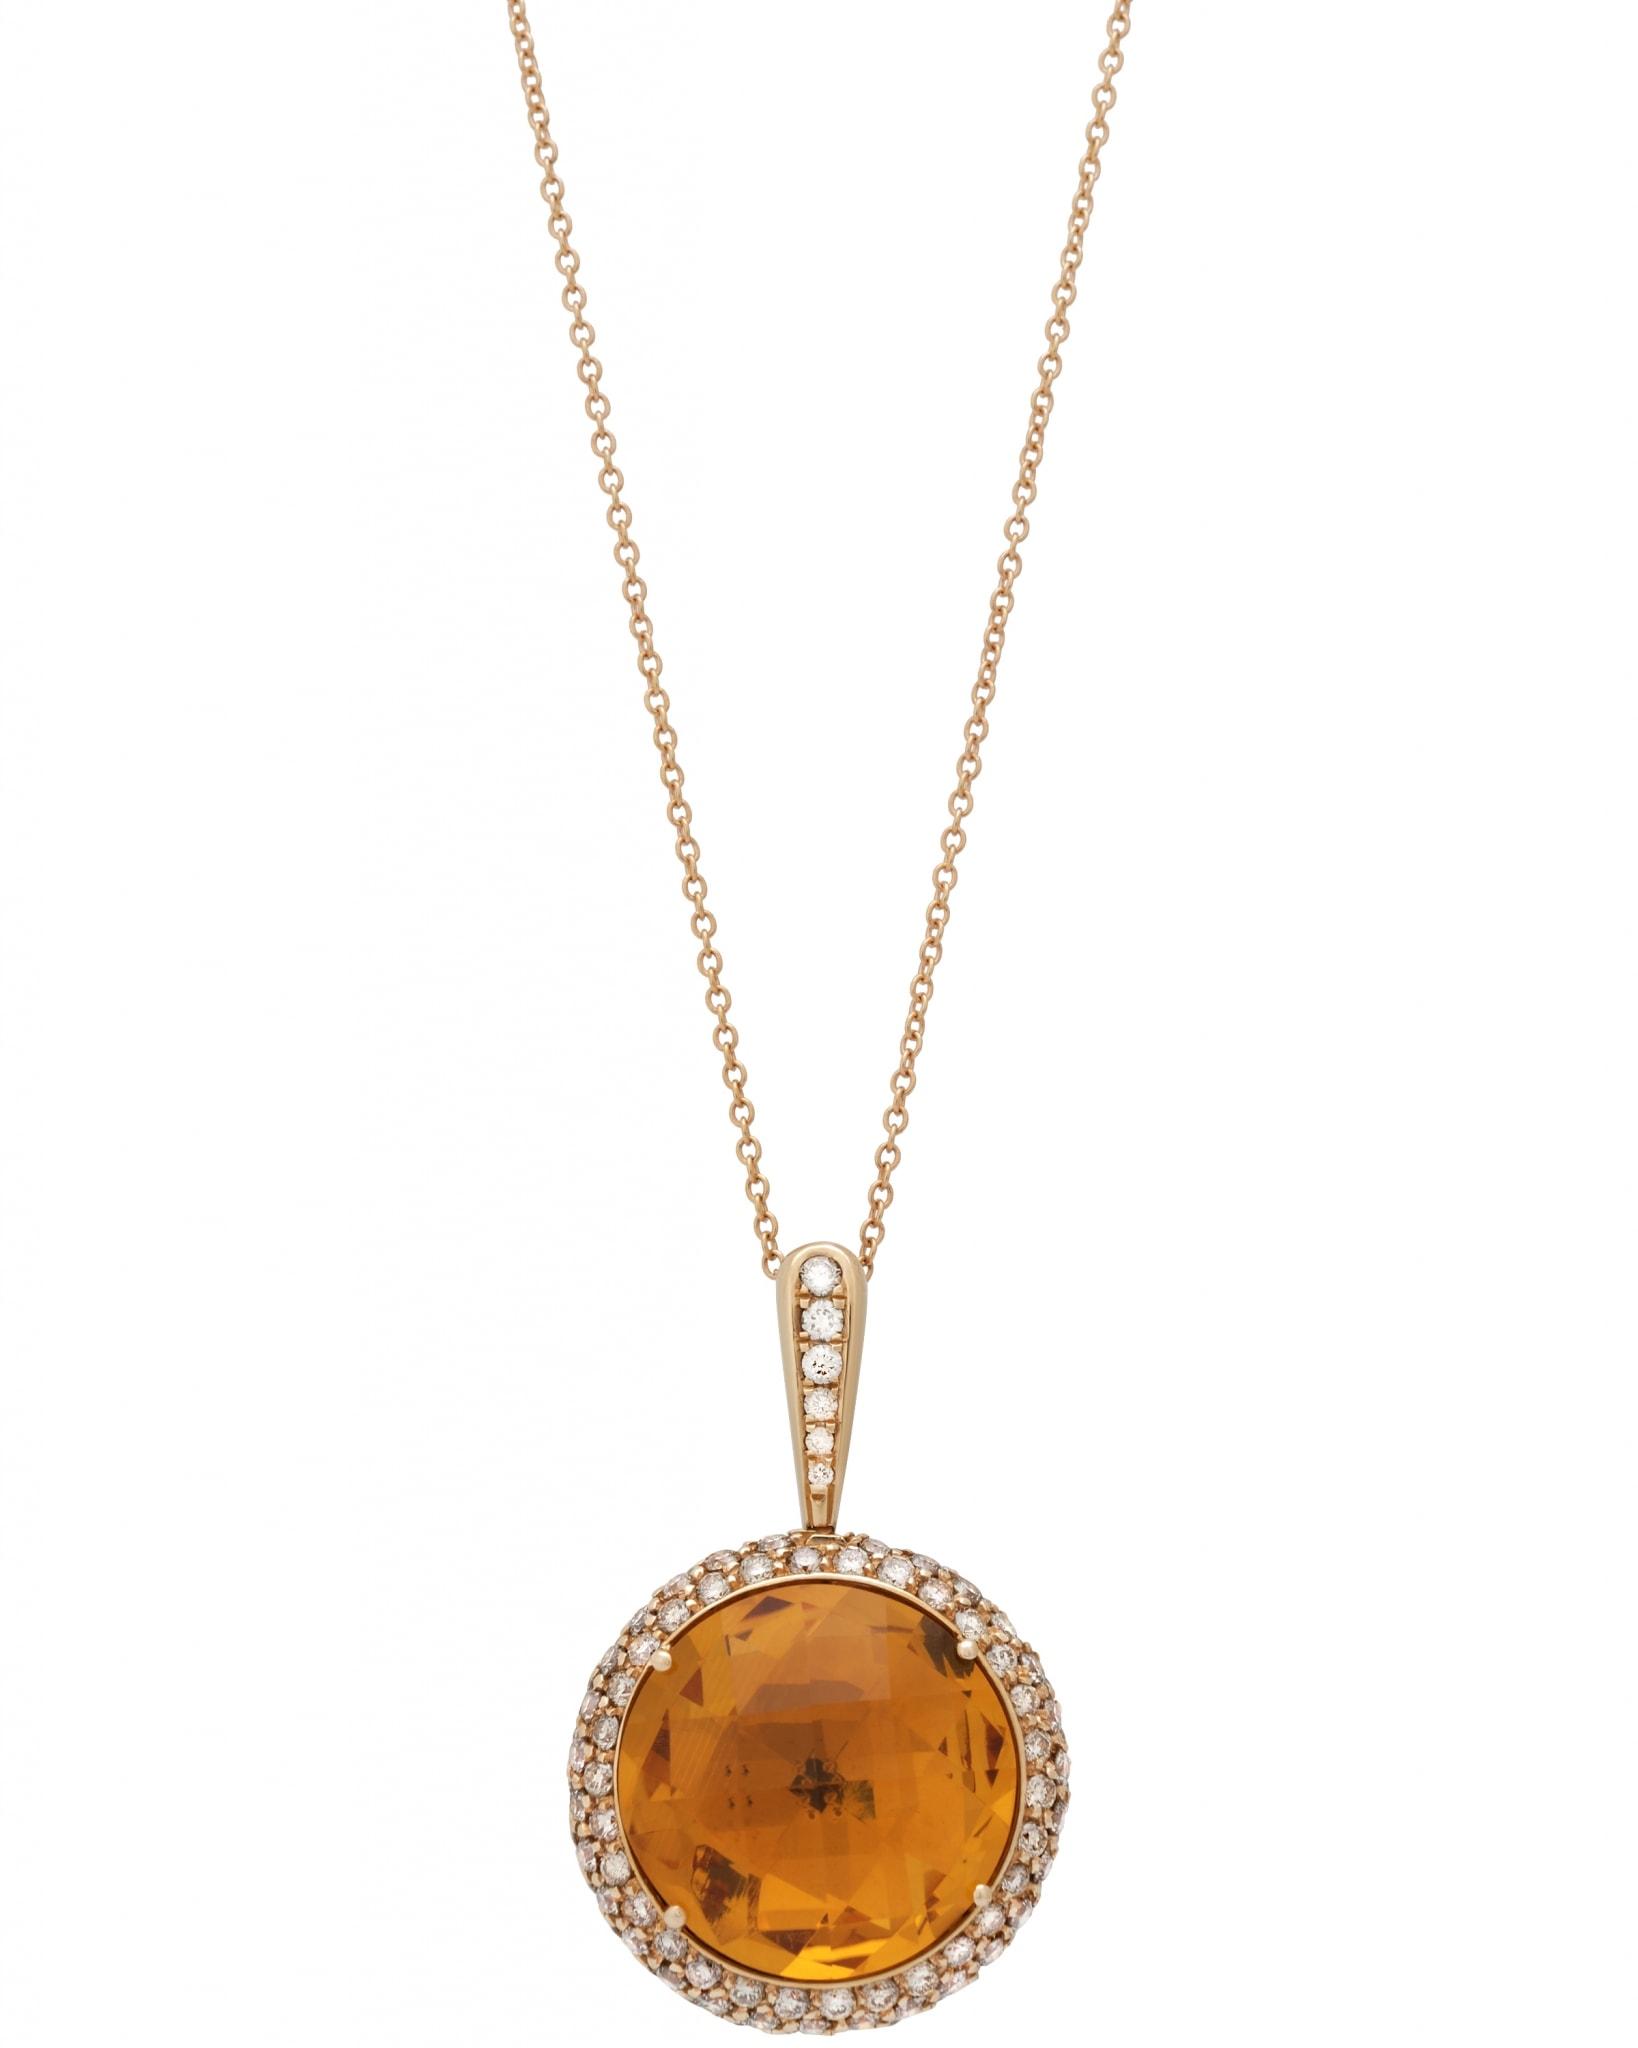 GIANNI LAZZARO – 18K Diamonds, & Topaz Citrine, Necklace 7289